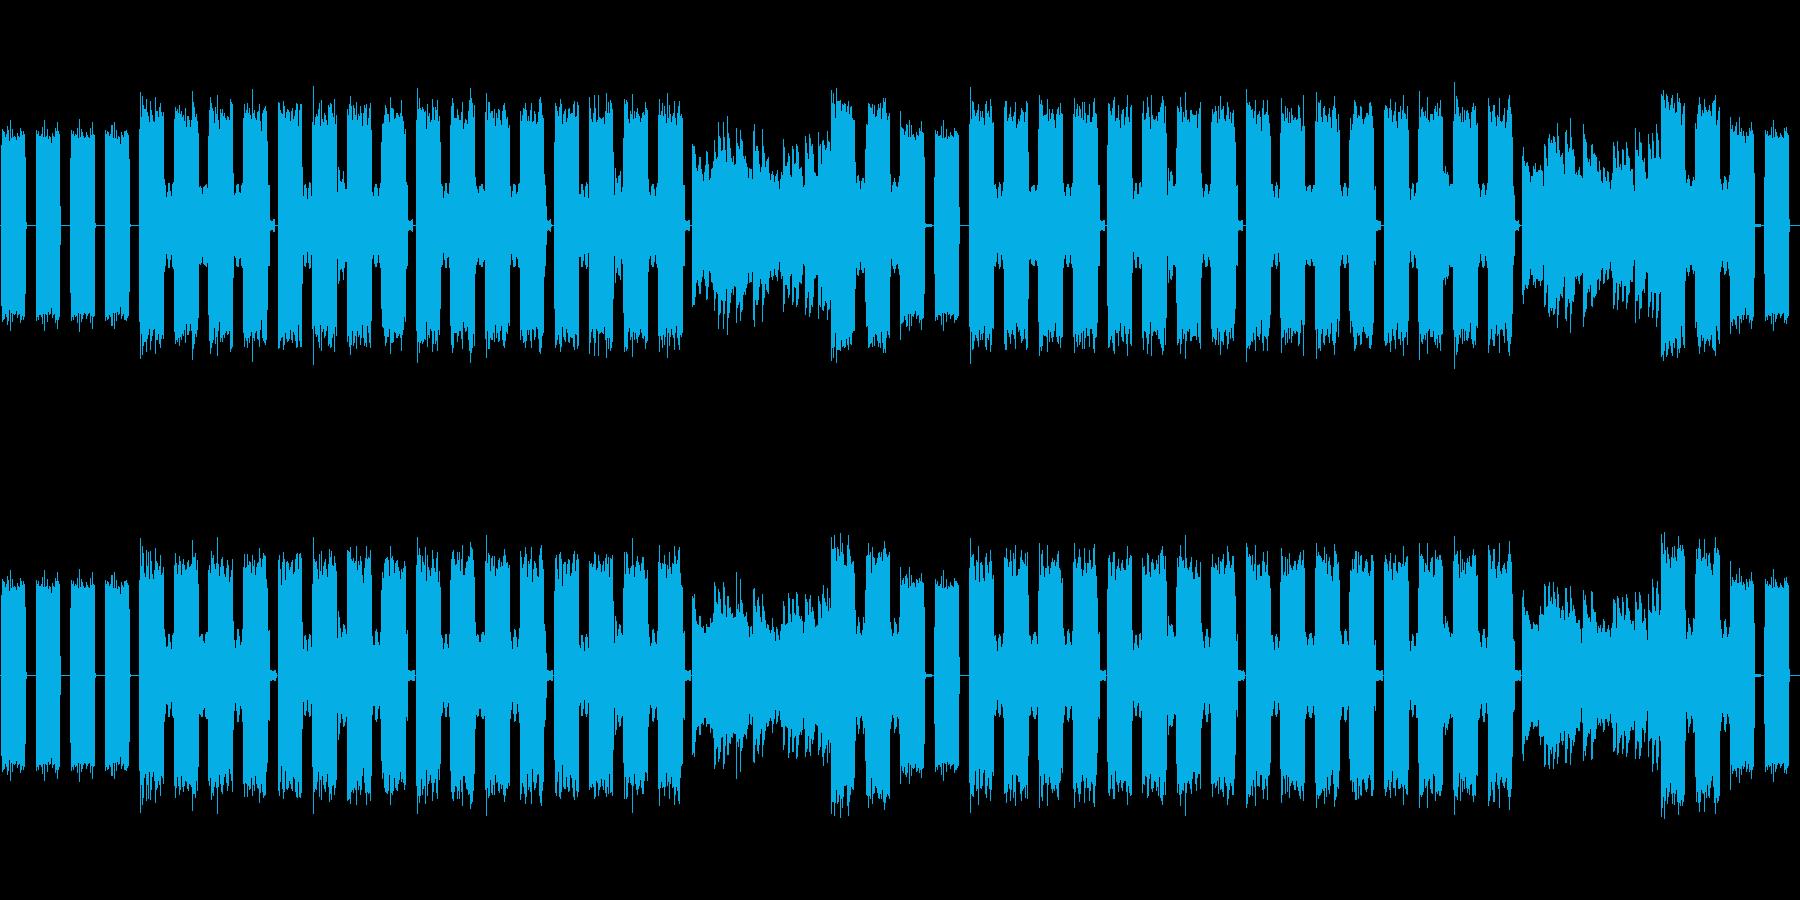 RPG系ダンジョン用BGMの再生済みの波形